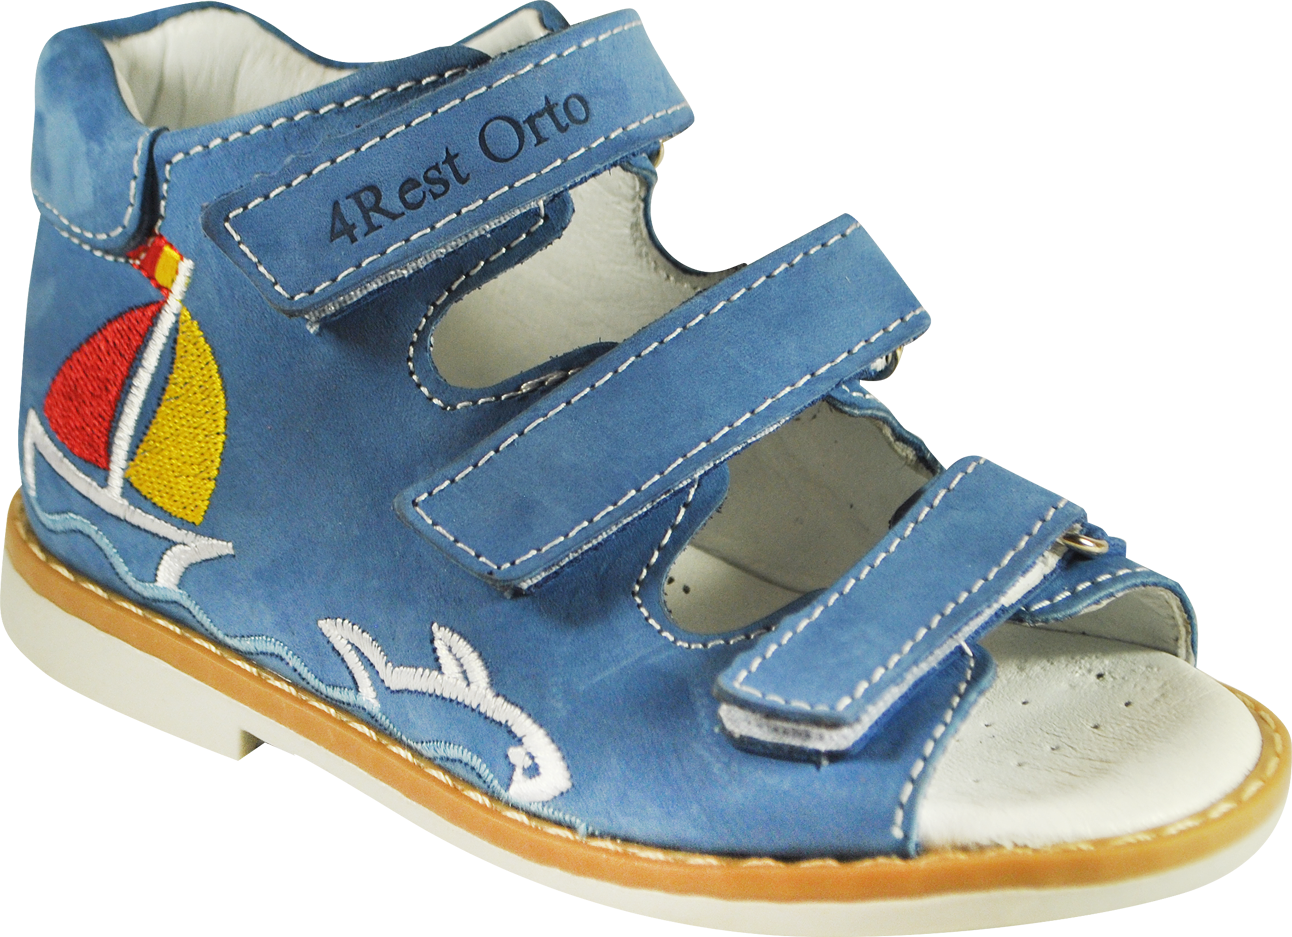 Orthopedic Sandals 06-114  size 21-30 - 1